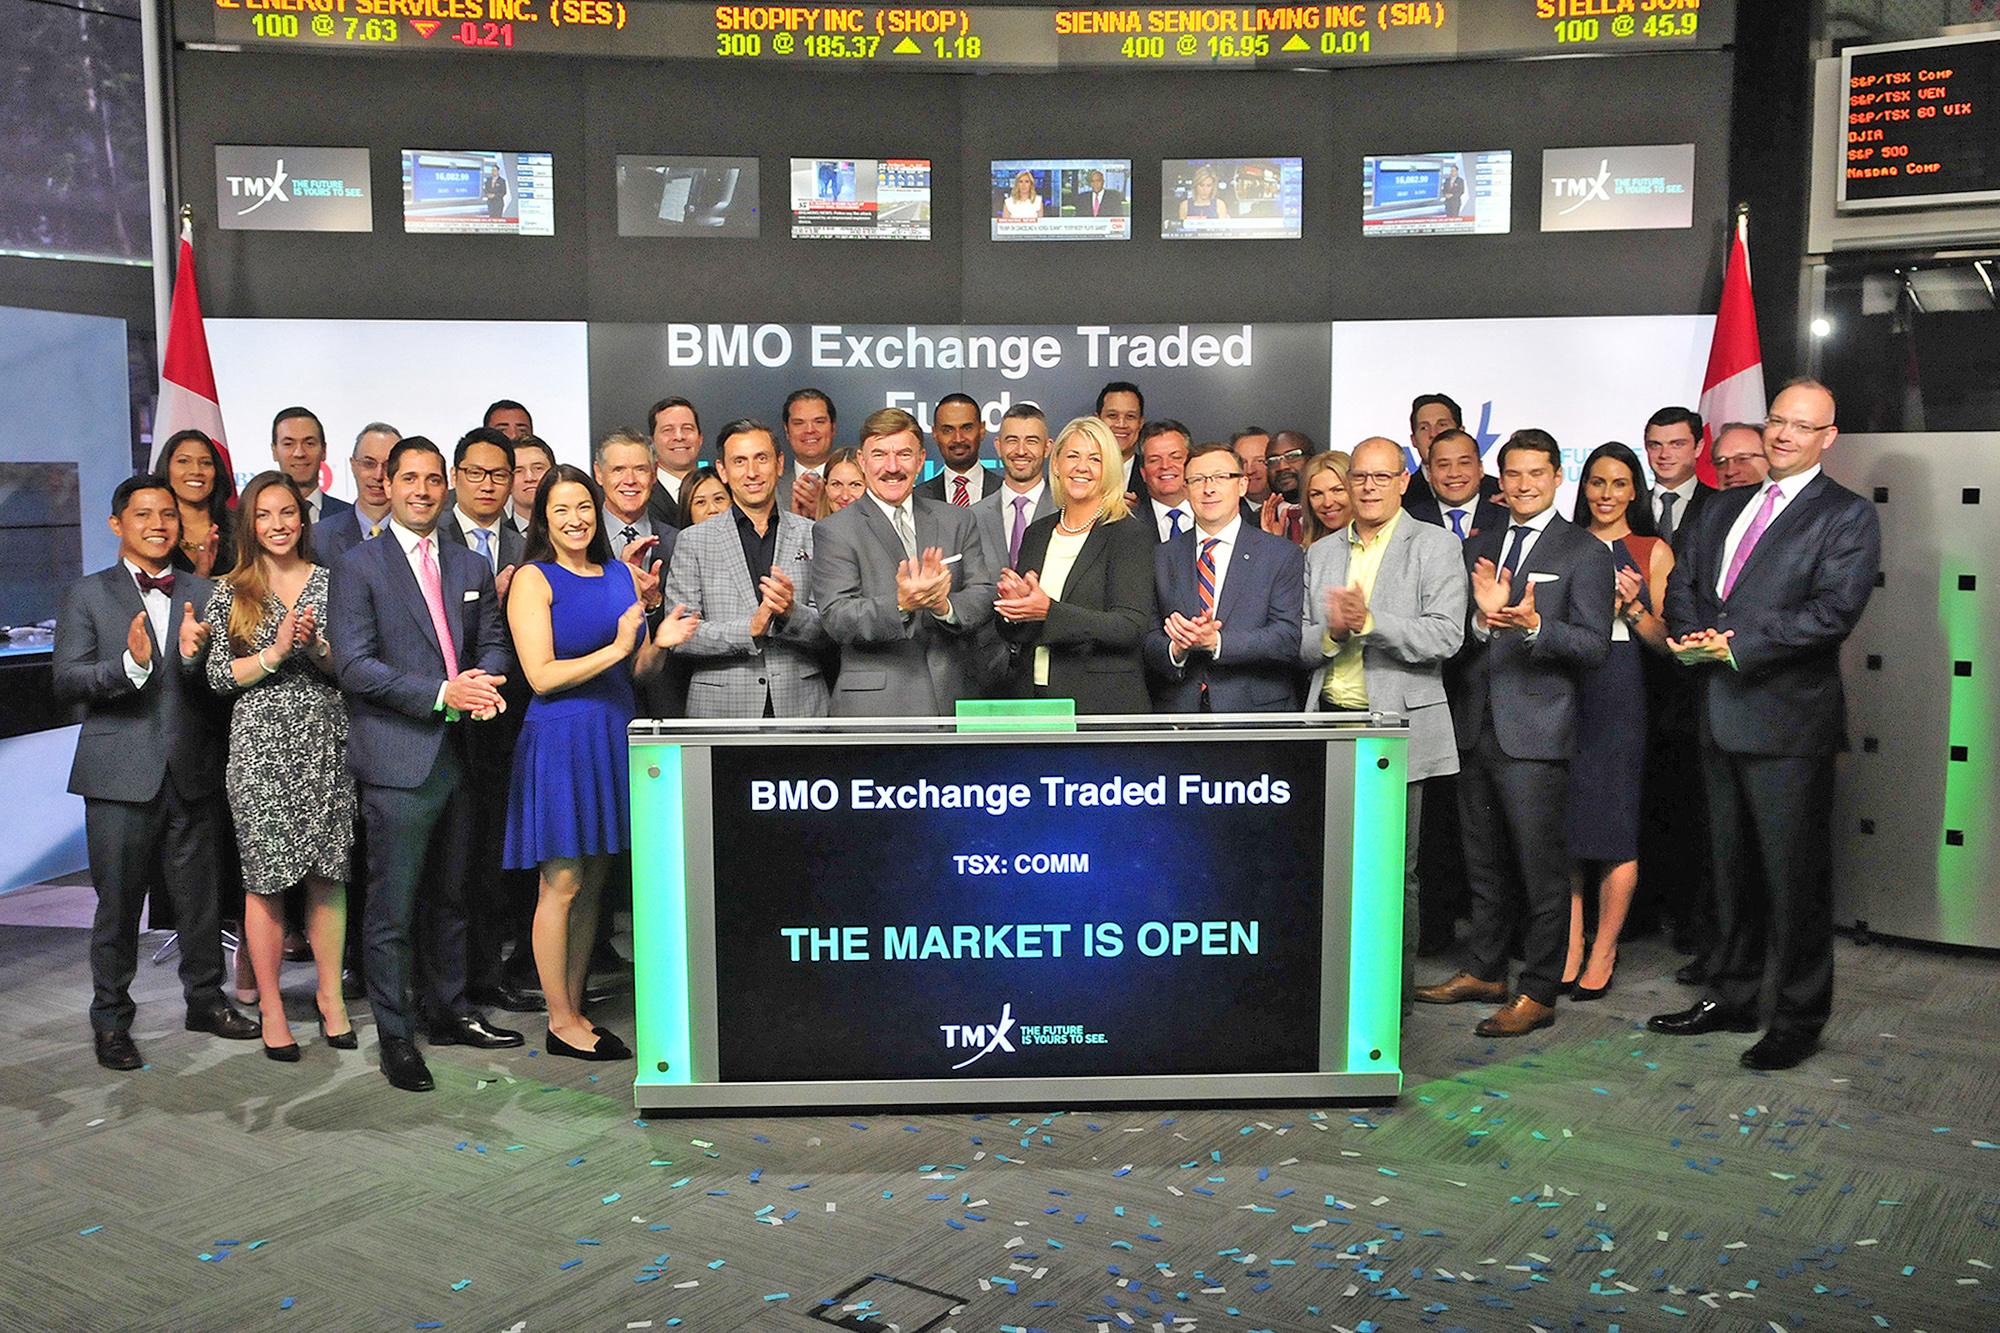 Tmx tsx tsxv news market opens bmo exchange traded funds opens the market publicscrutiny Choice Image